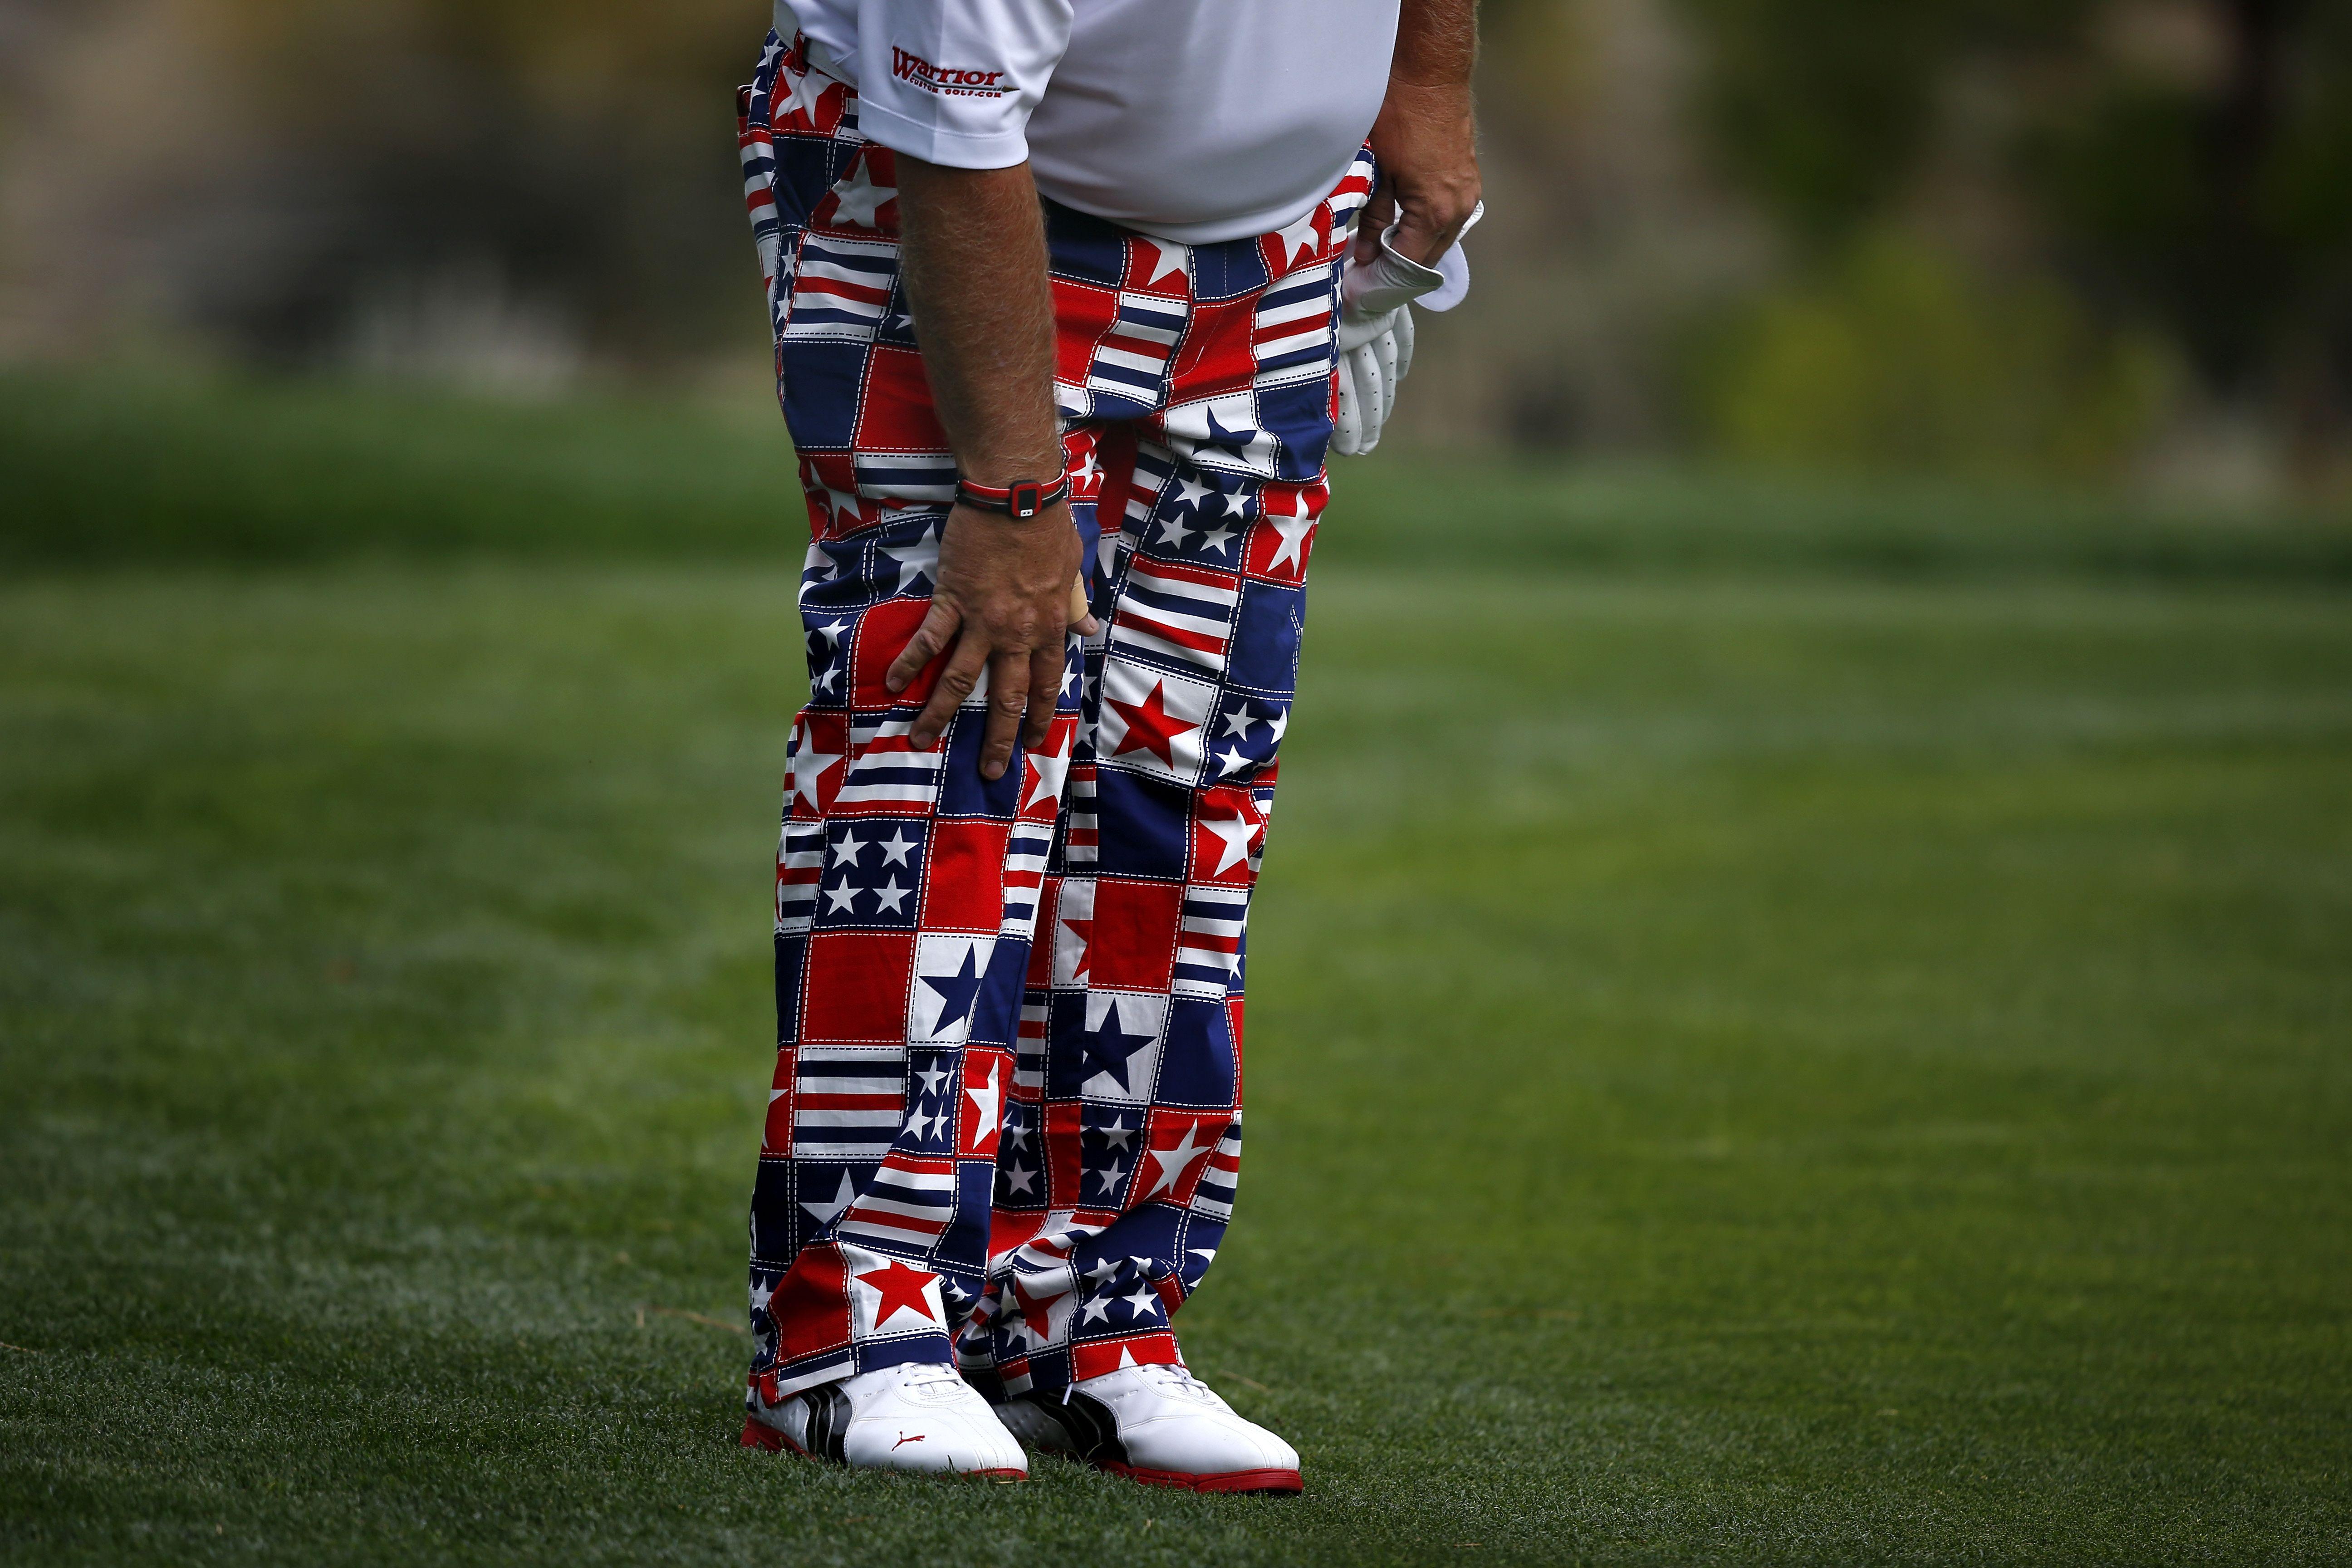 John Daly experiences knee pain during round of golf on PGA Tour